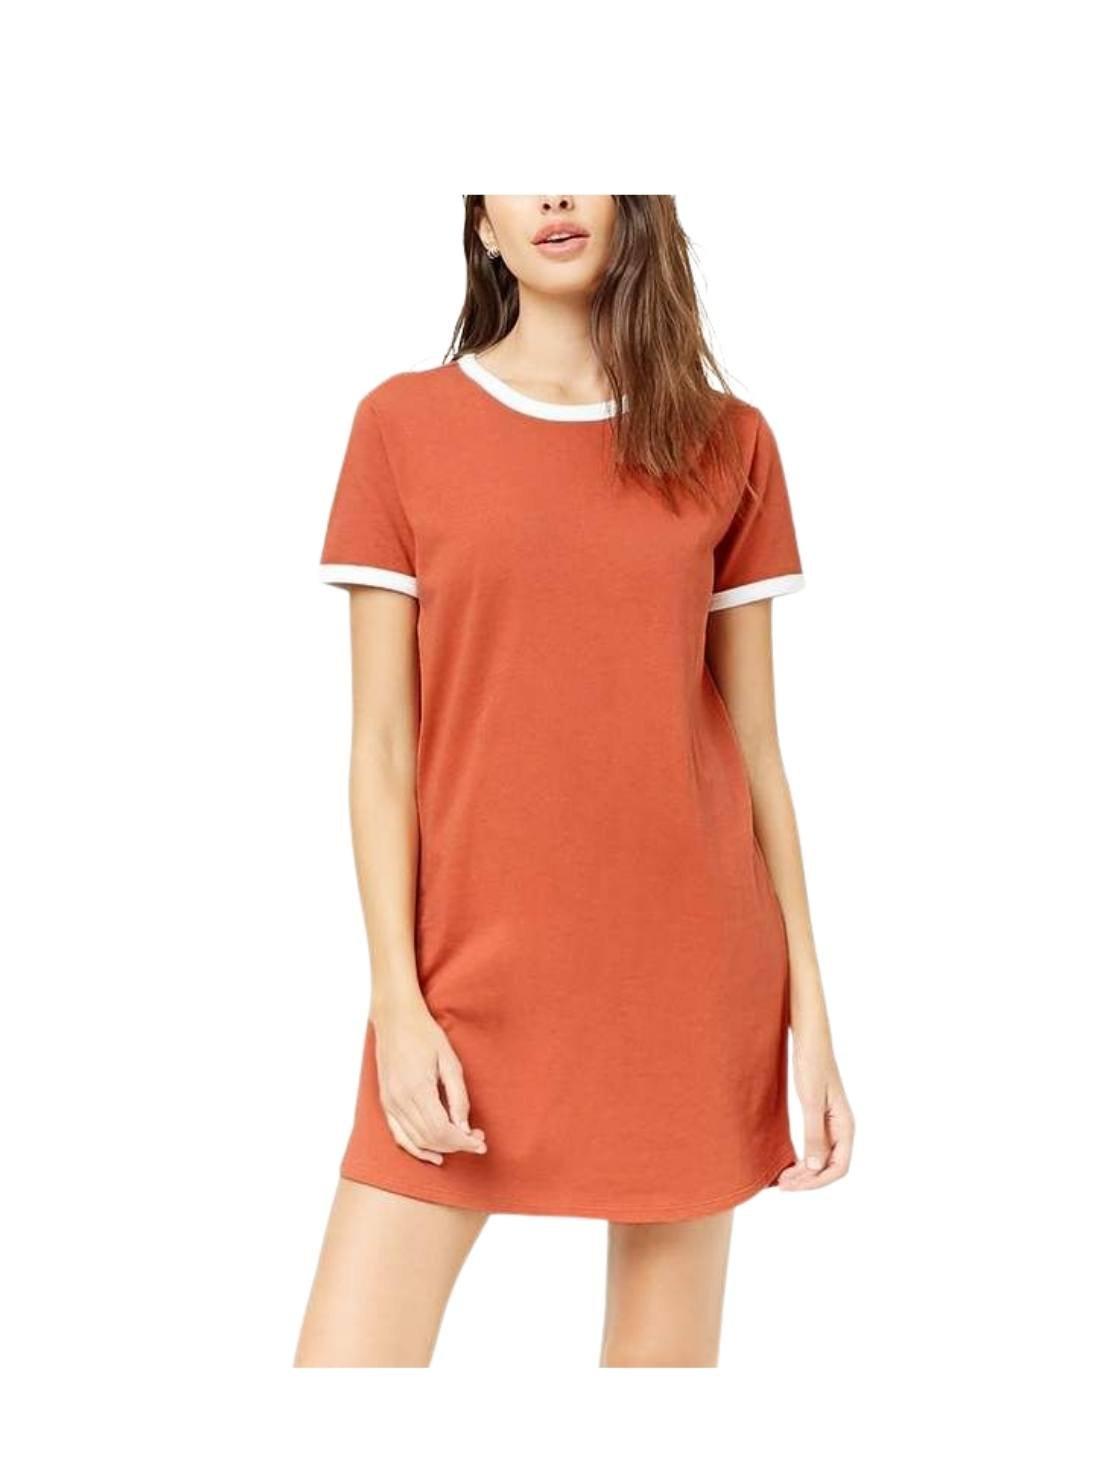 Wholesale Ringer T shirt Dresses (1)